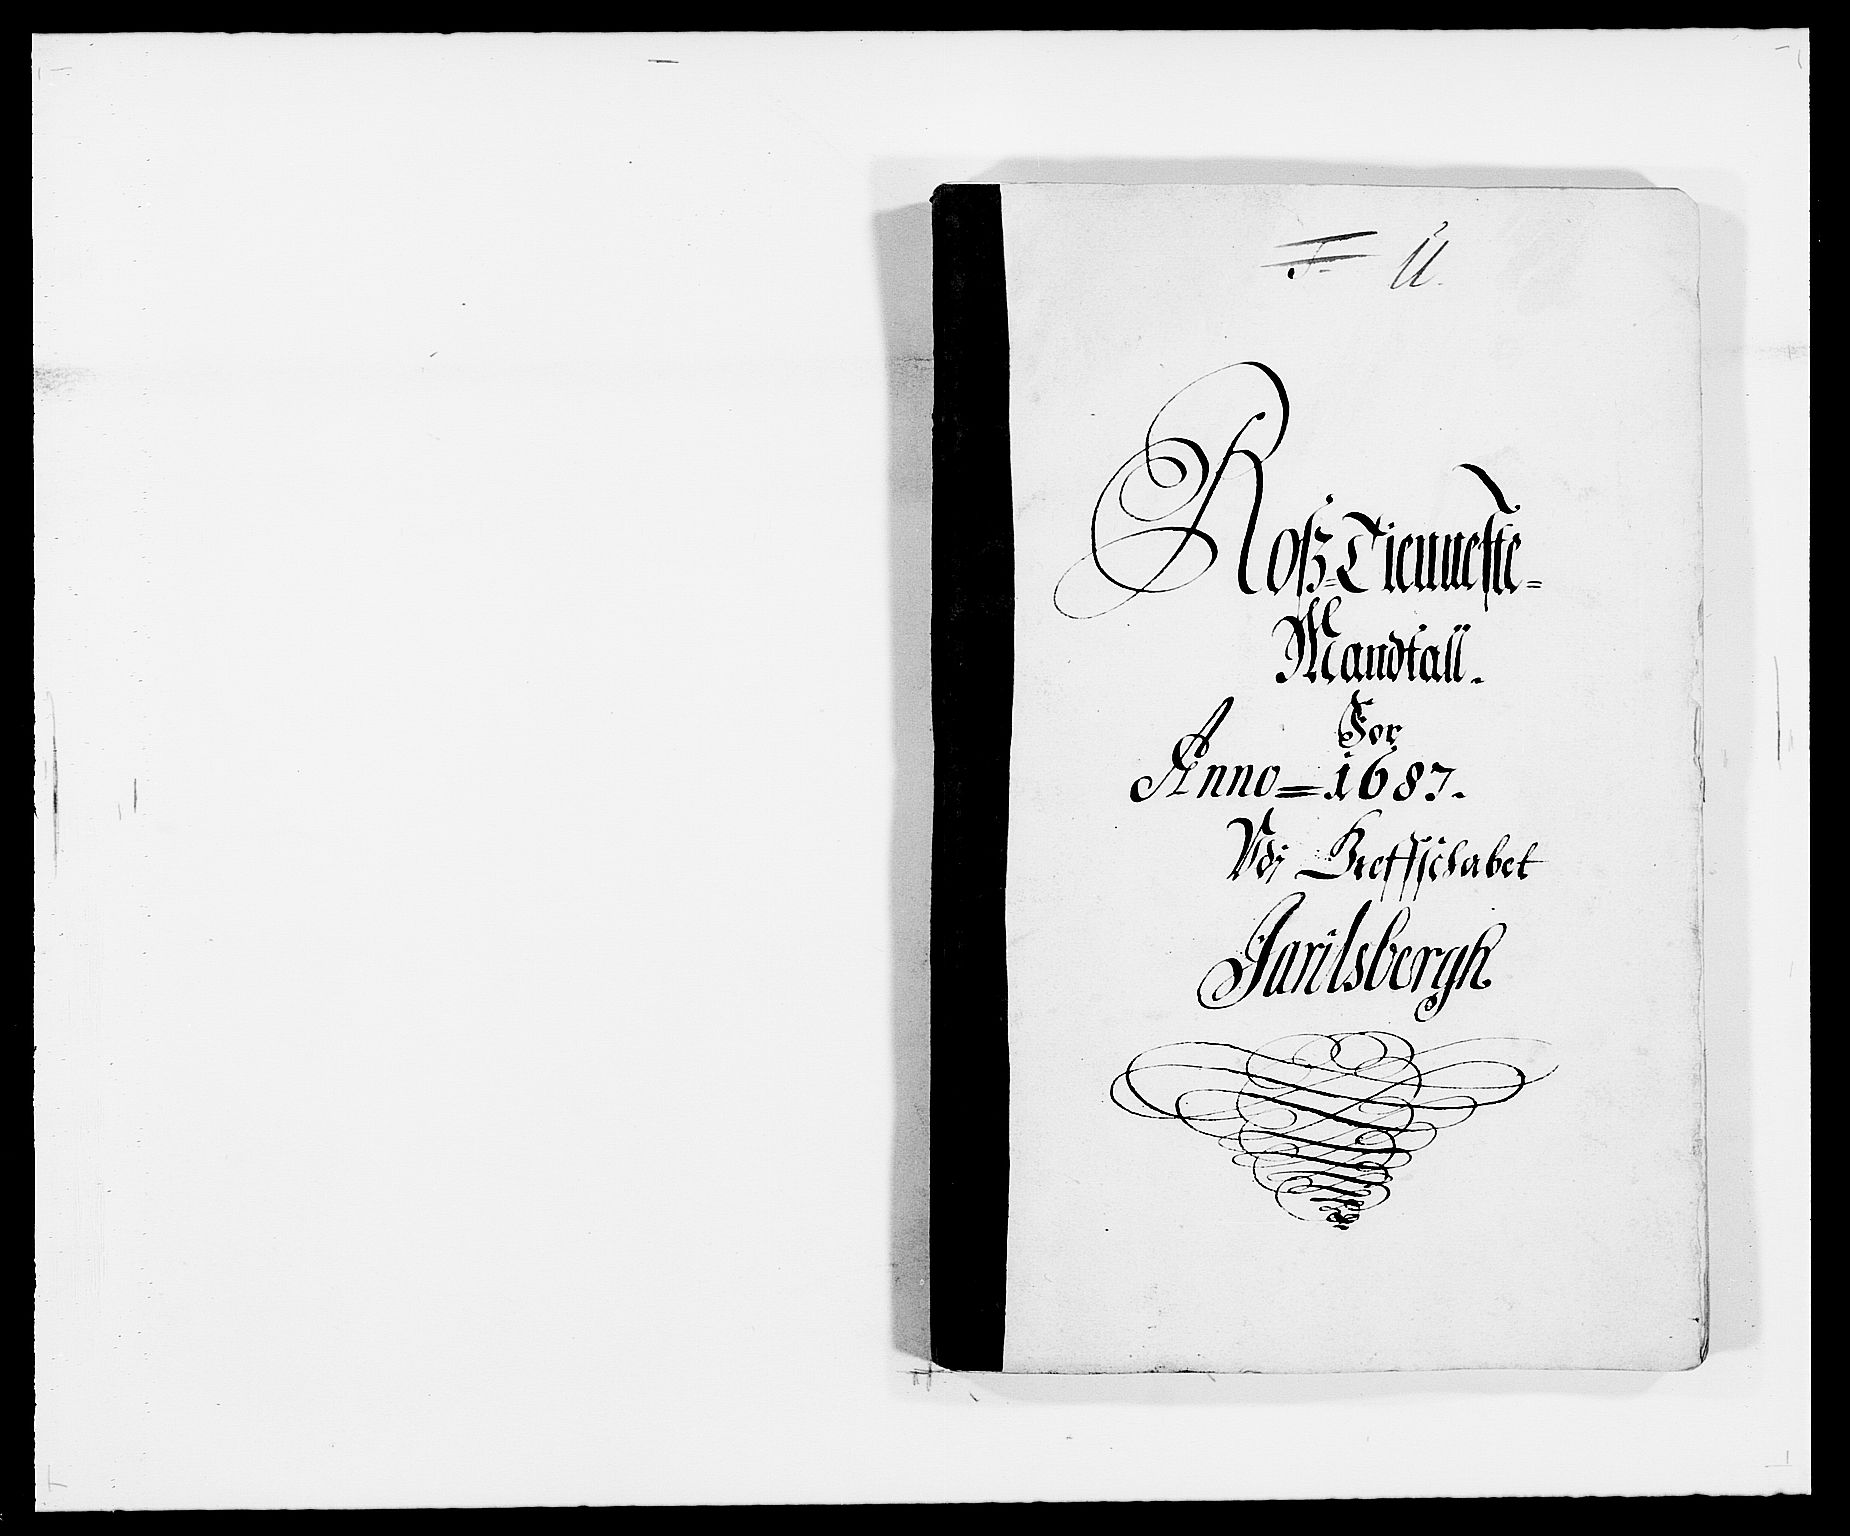 RA, Rentekammeret inntil 1814, Reviderte regnskaper, Fogderegnskap, R32/L1858: Fogderegnskap Jarlsberg grevskap, 1686-1690, s. 332